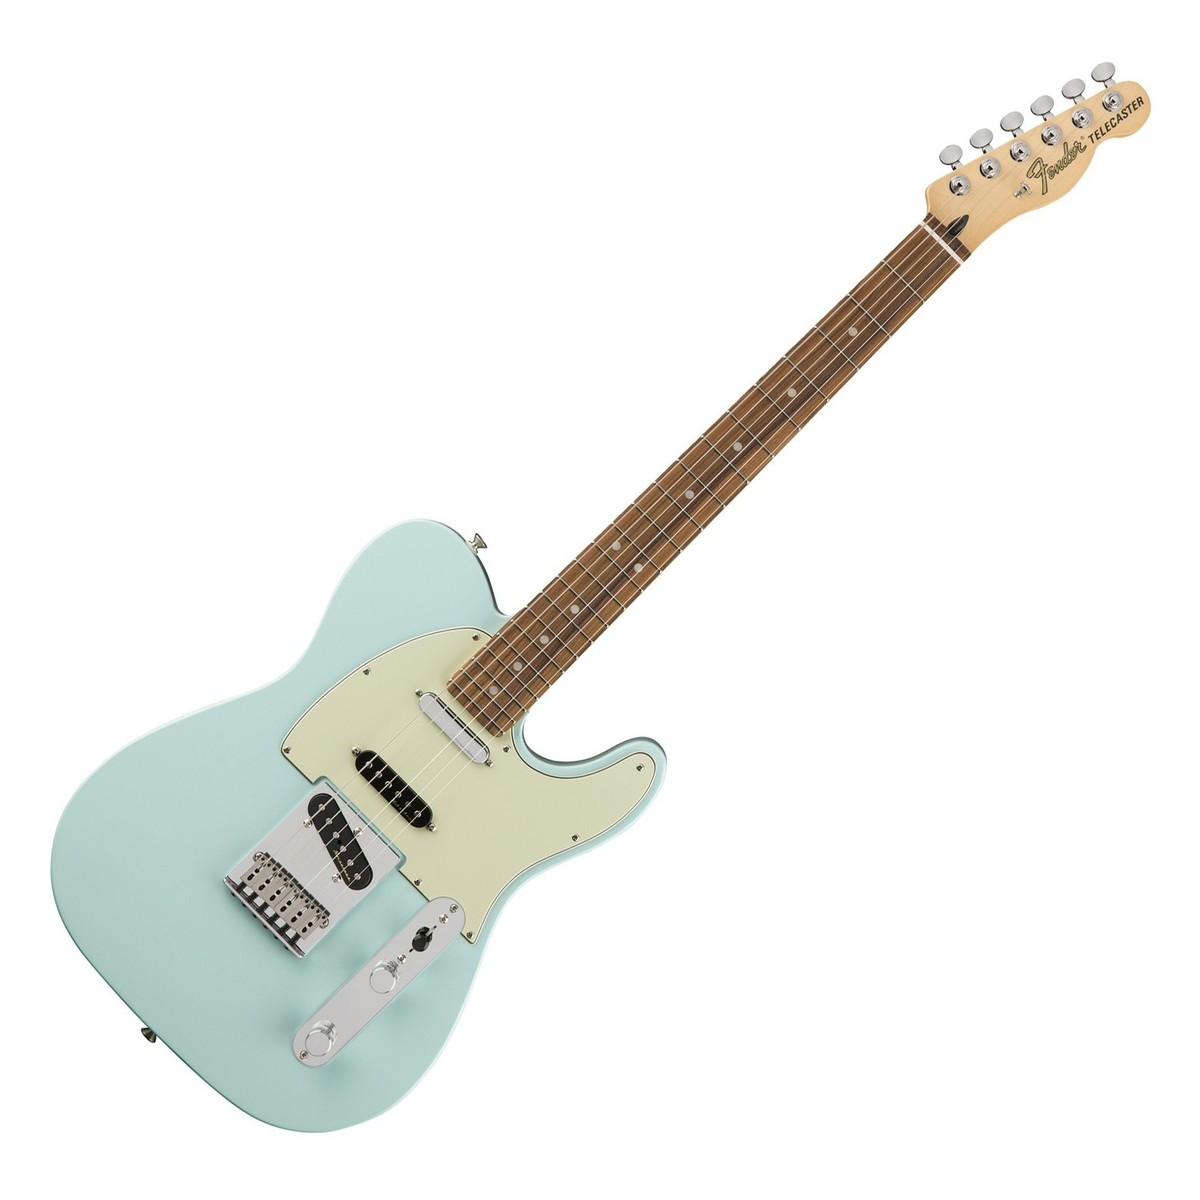 Fender deluxe nashville telecaster pf daphne blue at gear4music fender deluxe nashville telecaster electric guitar pf daphne blue loading zoom publicscrutiny Gallery